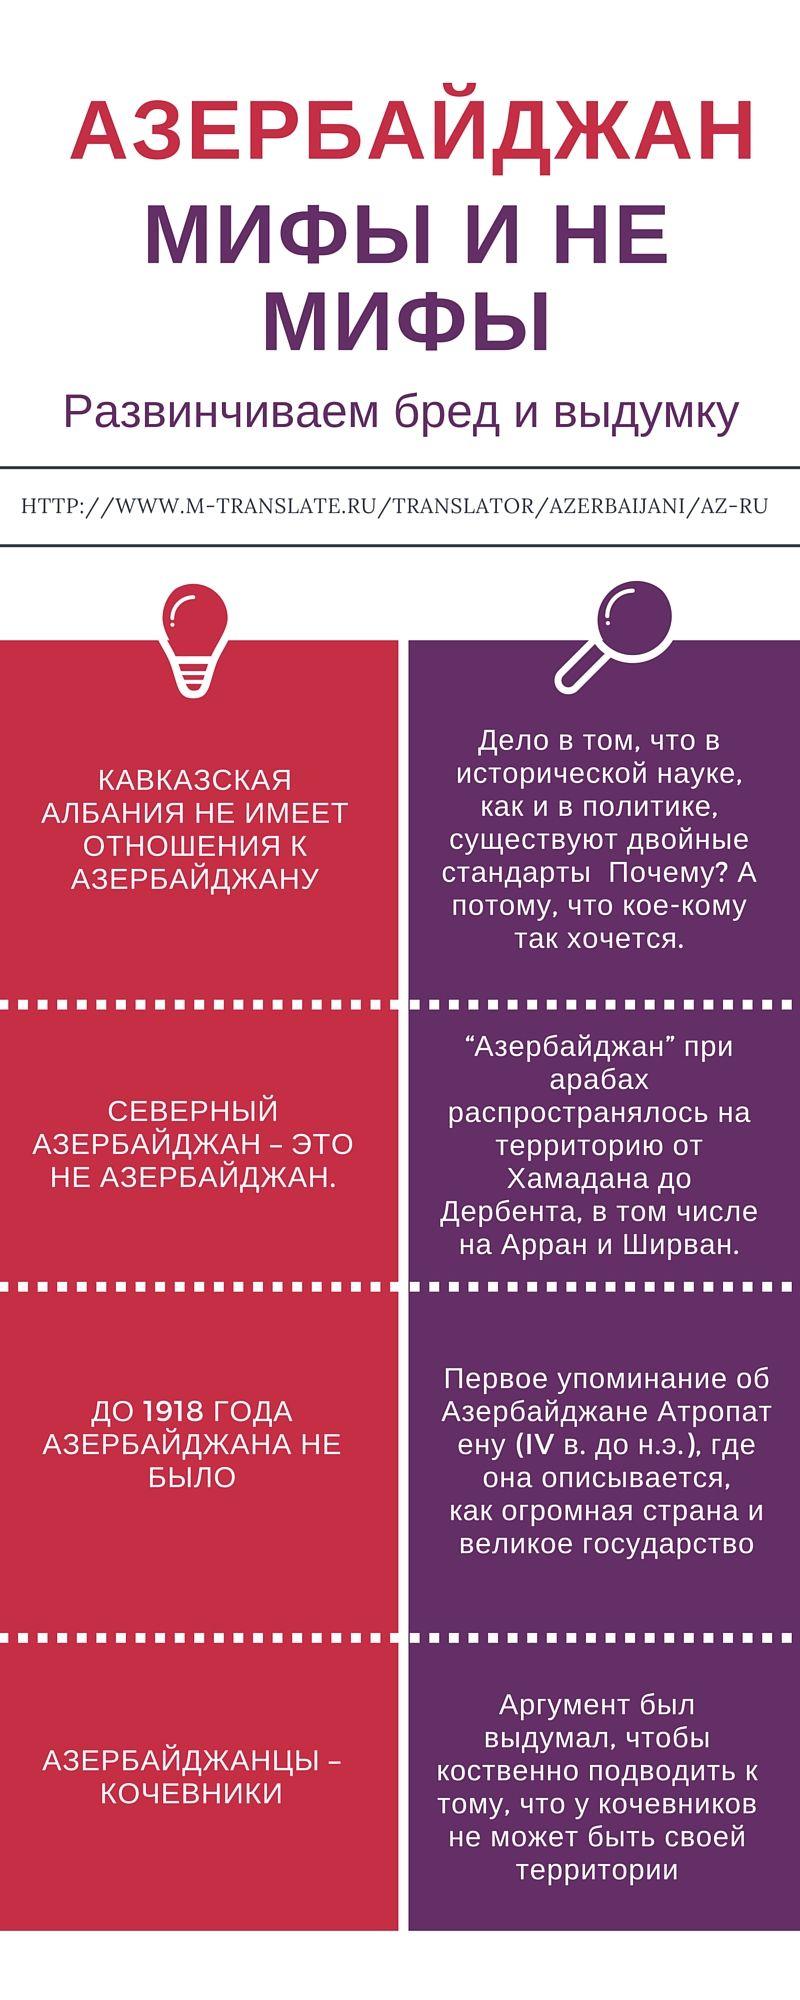 Perevodchik S Azerbajdzhanskogo Na Russkij Onlajn